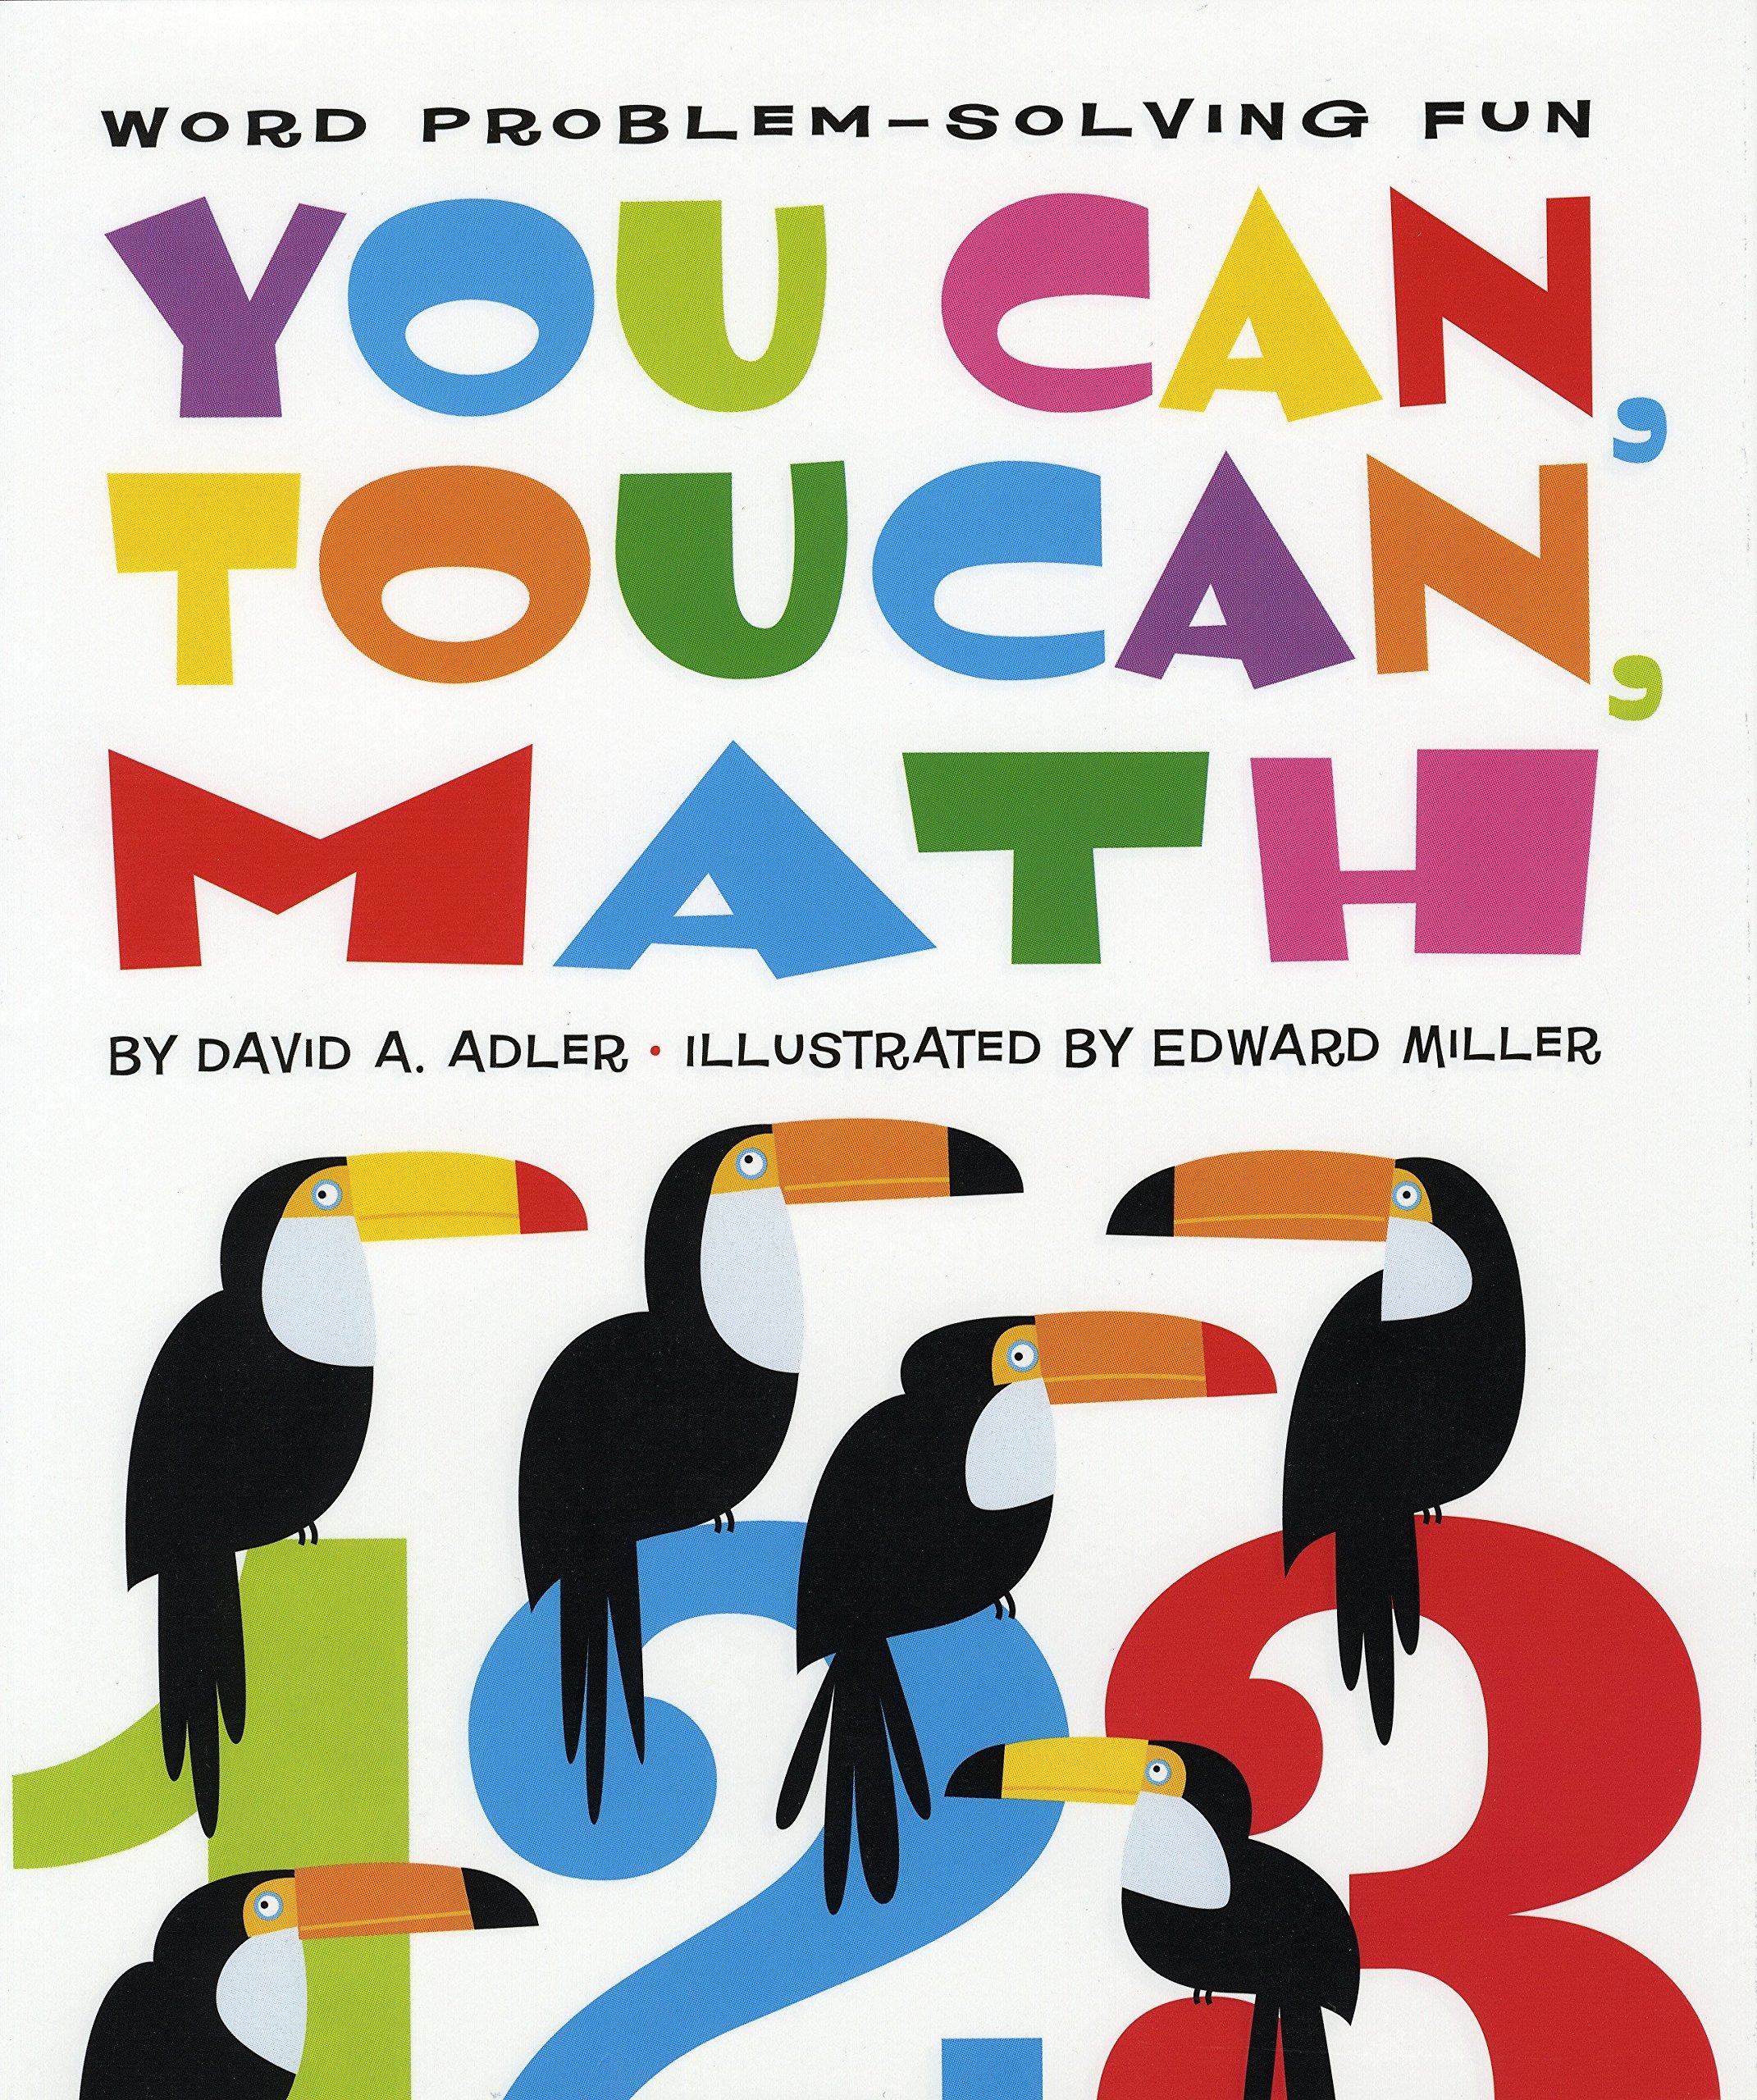 You Can, Toucan, Math: Word Problem-Solving Fun